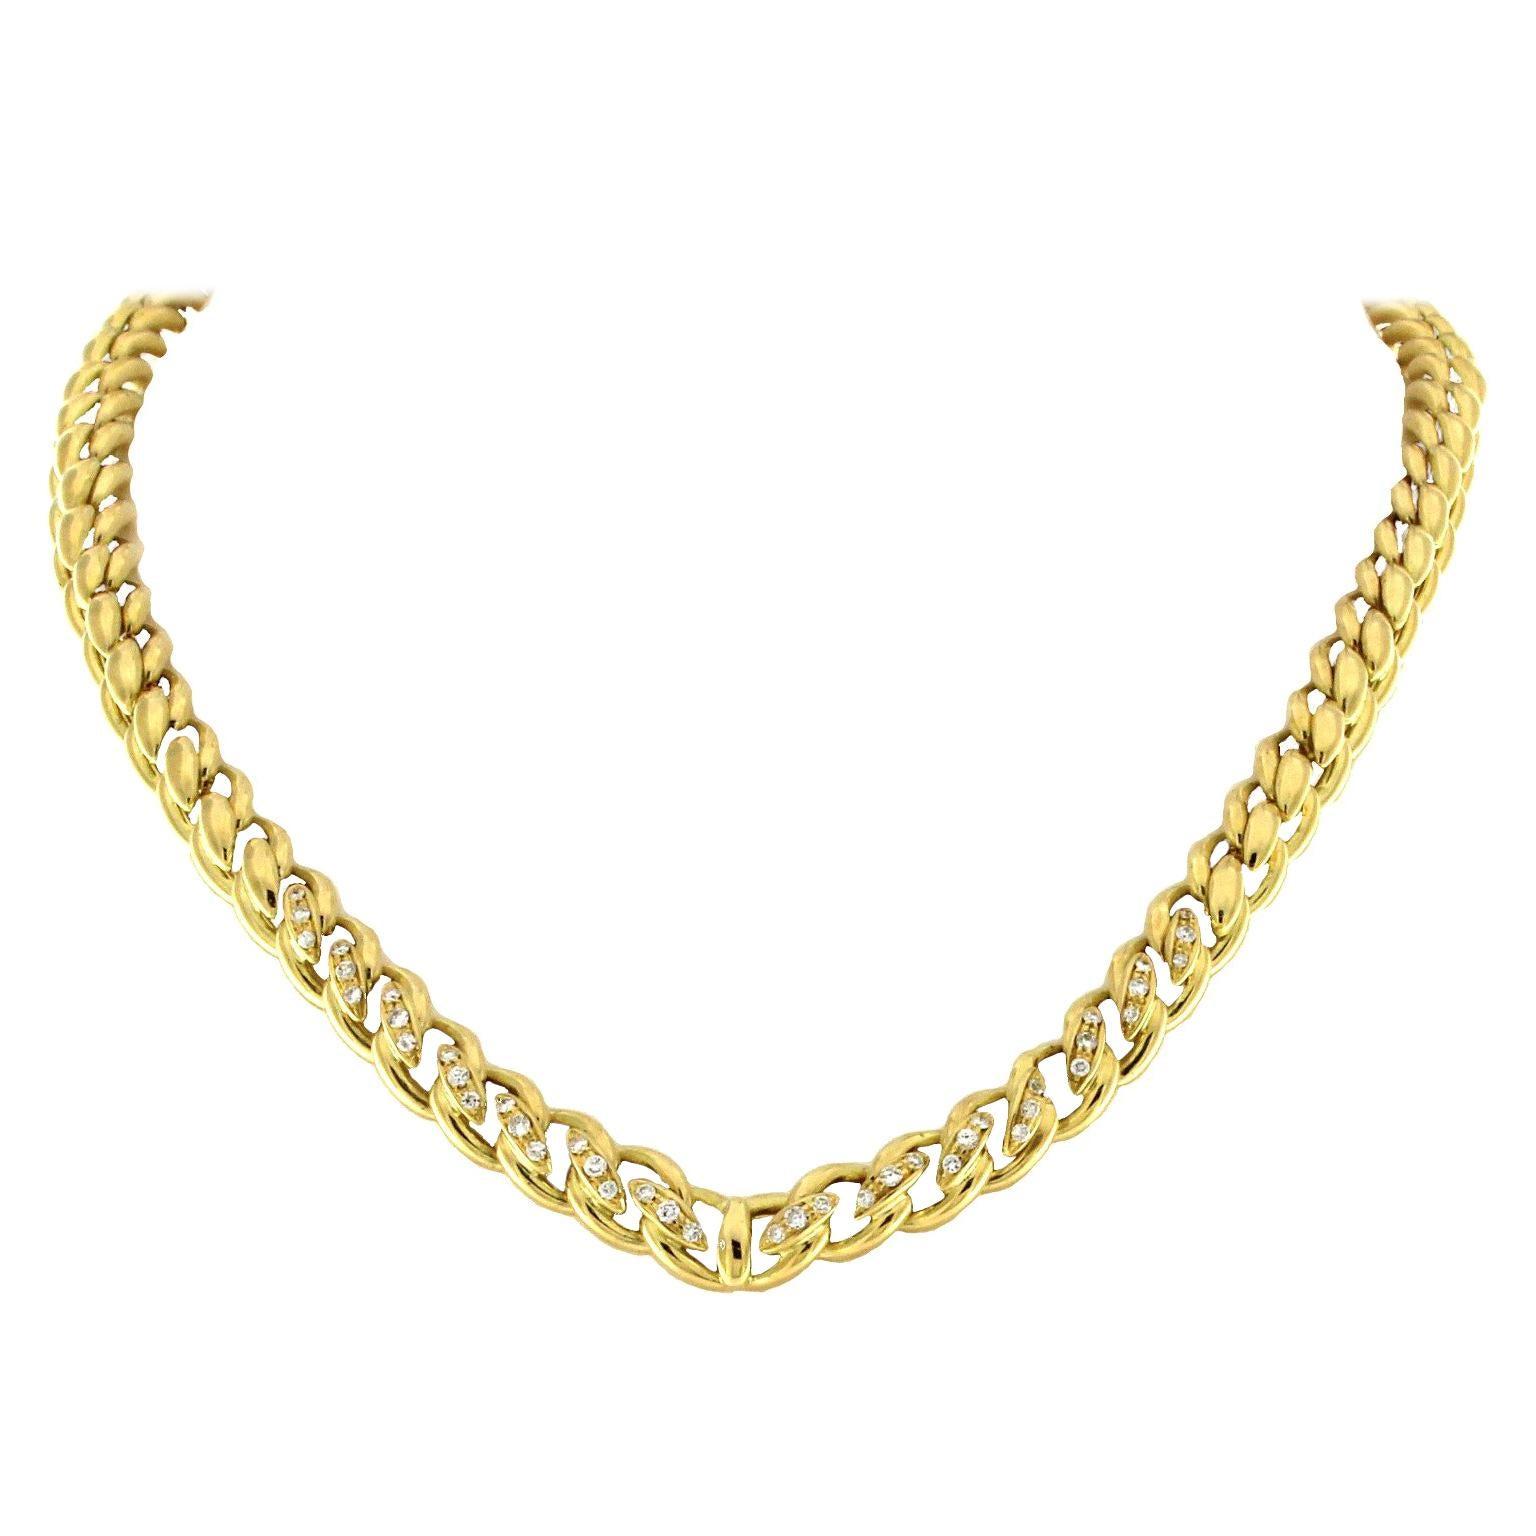 18 Karat Yellow Gold Groumette Necklace with Diamonds